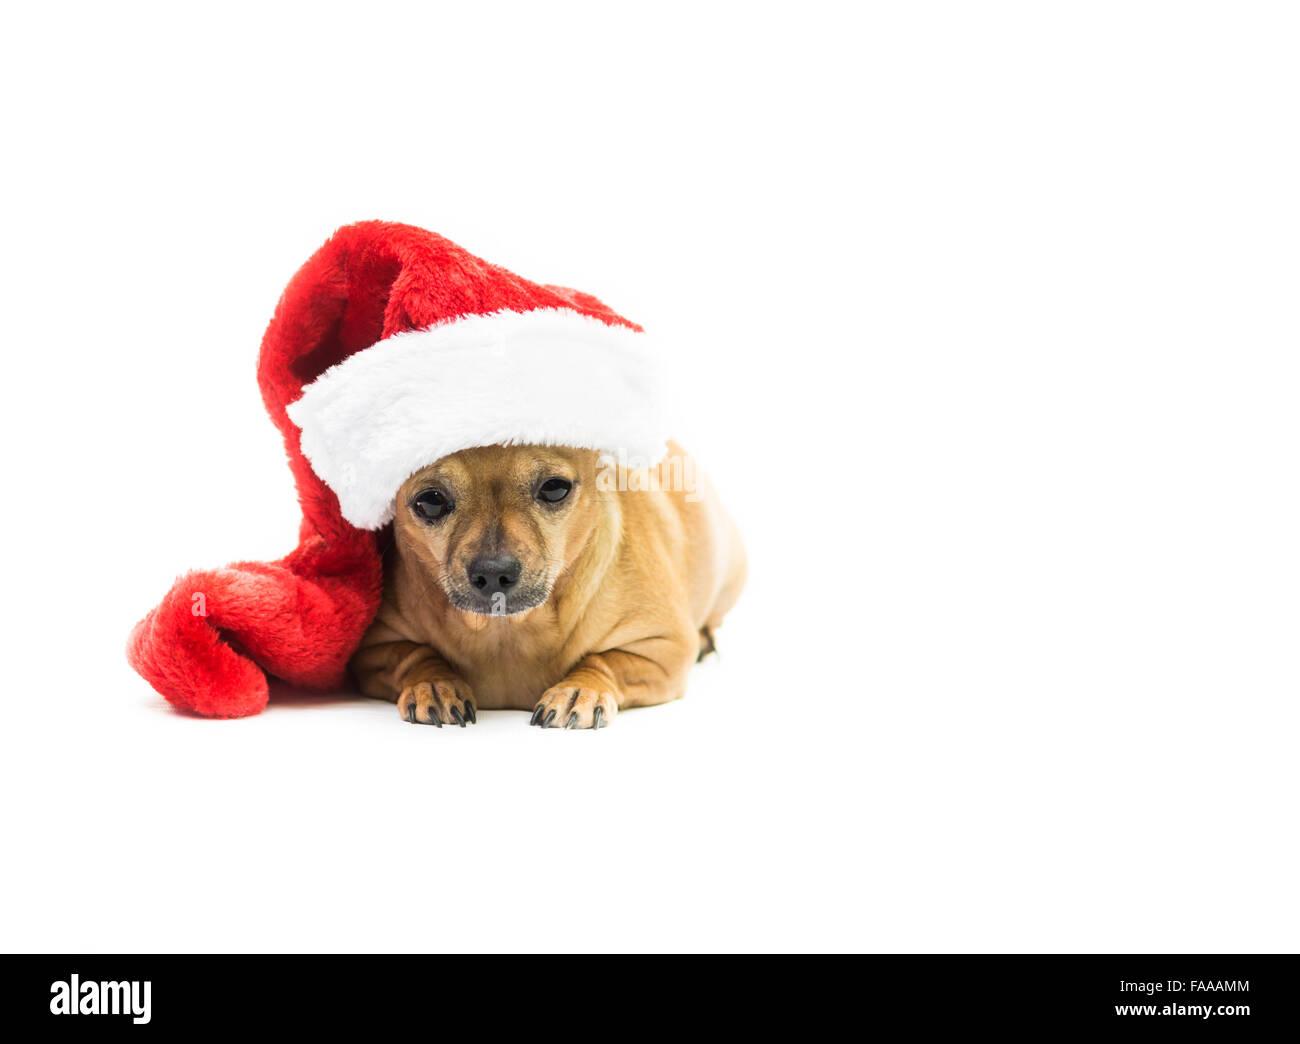 Chihuahua Dog Wearing Christmas Stocking - left side - Stock Image